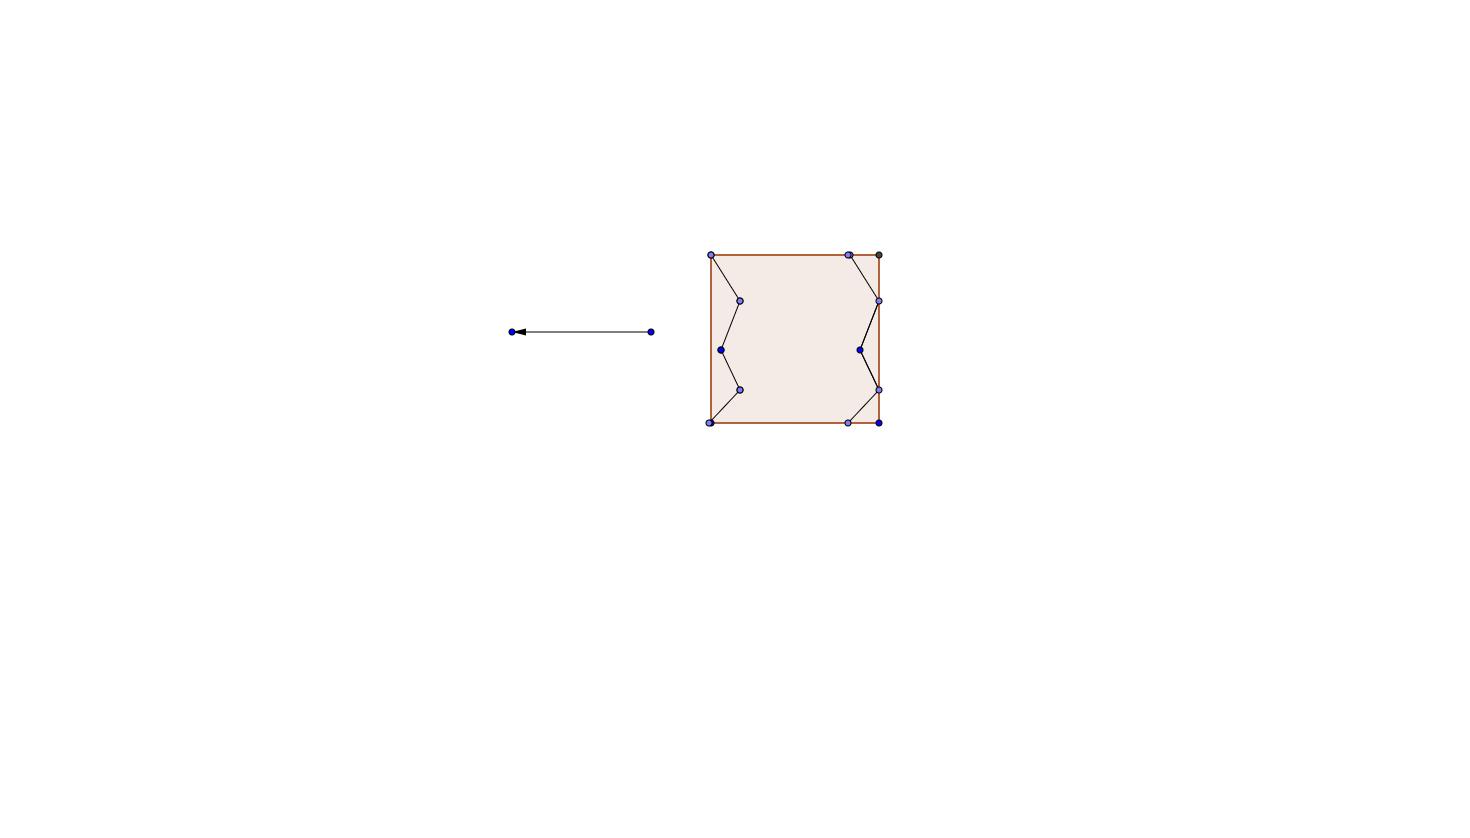 Tessellation Step 2: Translating First Side